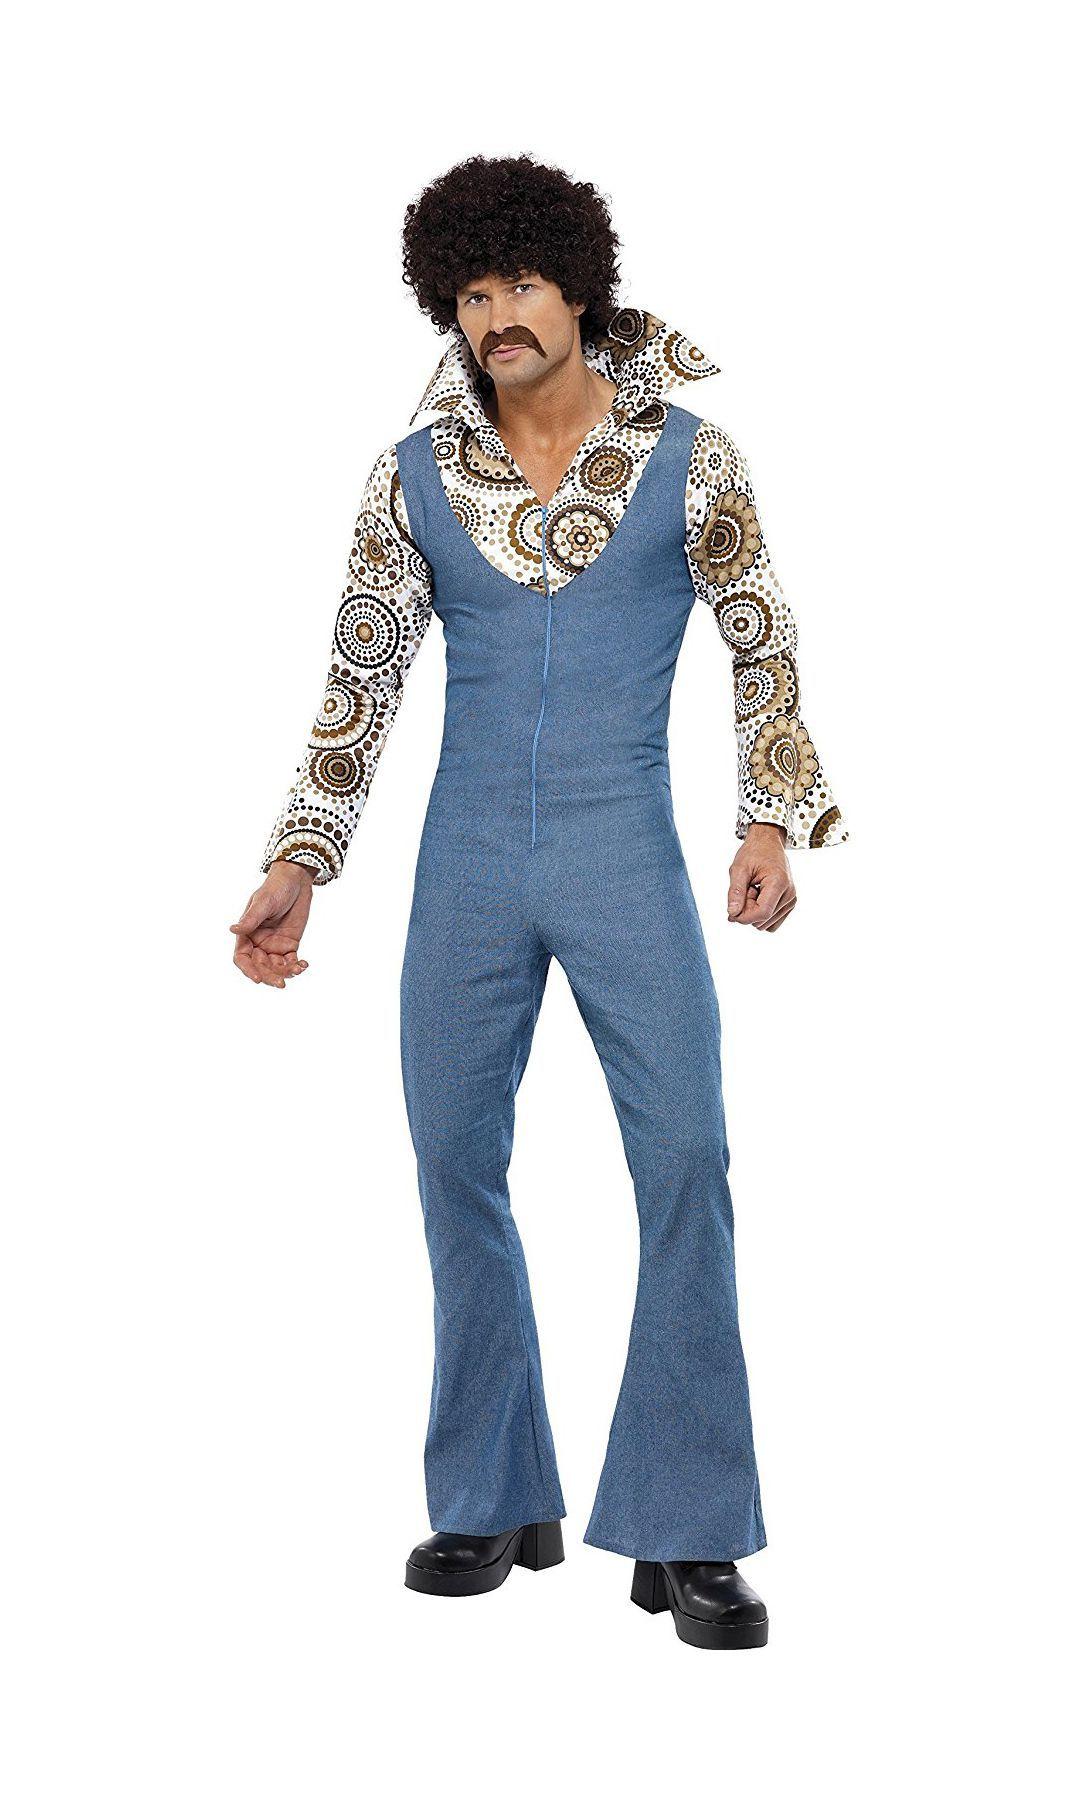 70S Halloween Costume | Best 70s Halloween Costumes 2018 Cute Diy 70s Costume Ideas